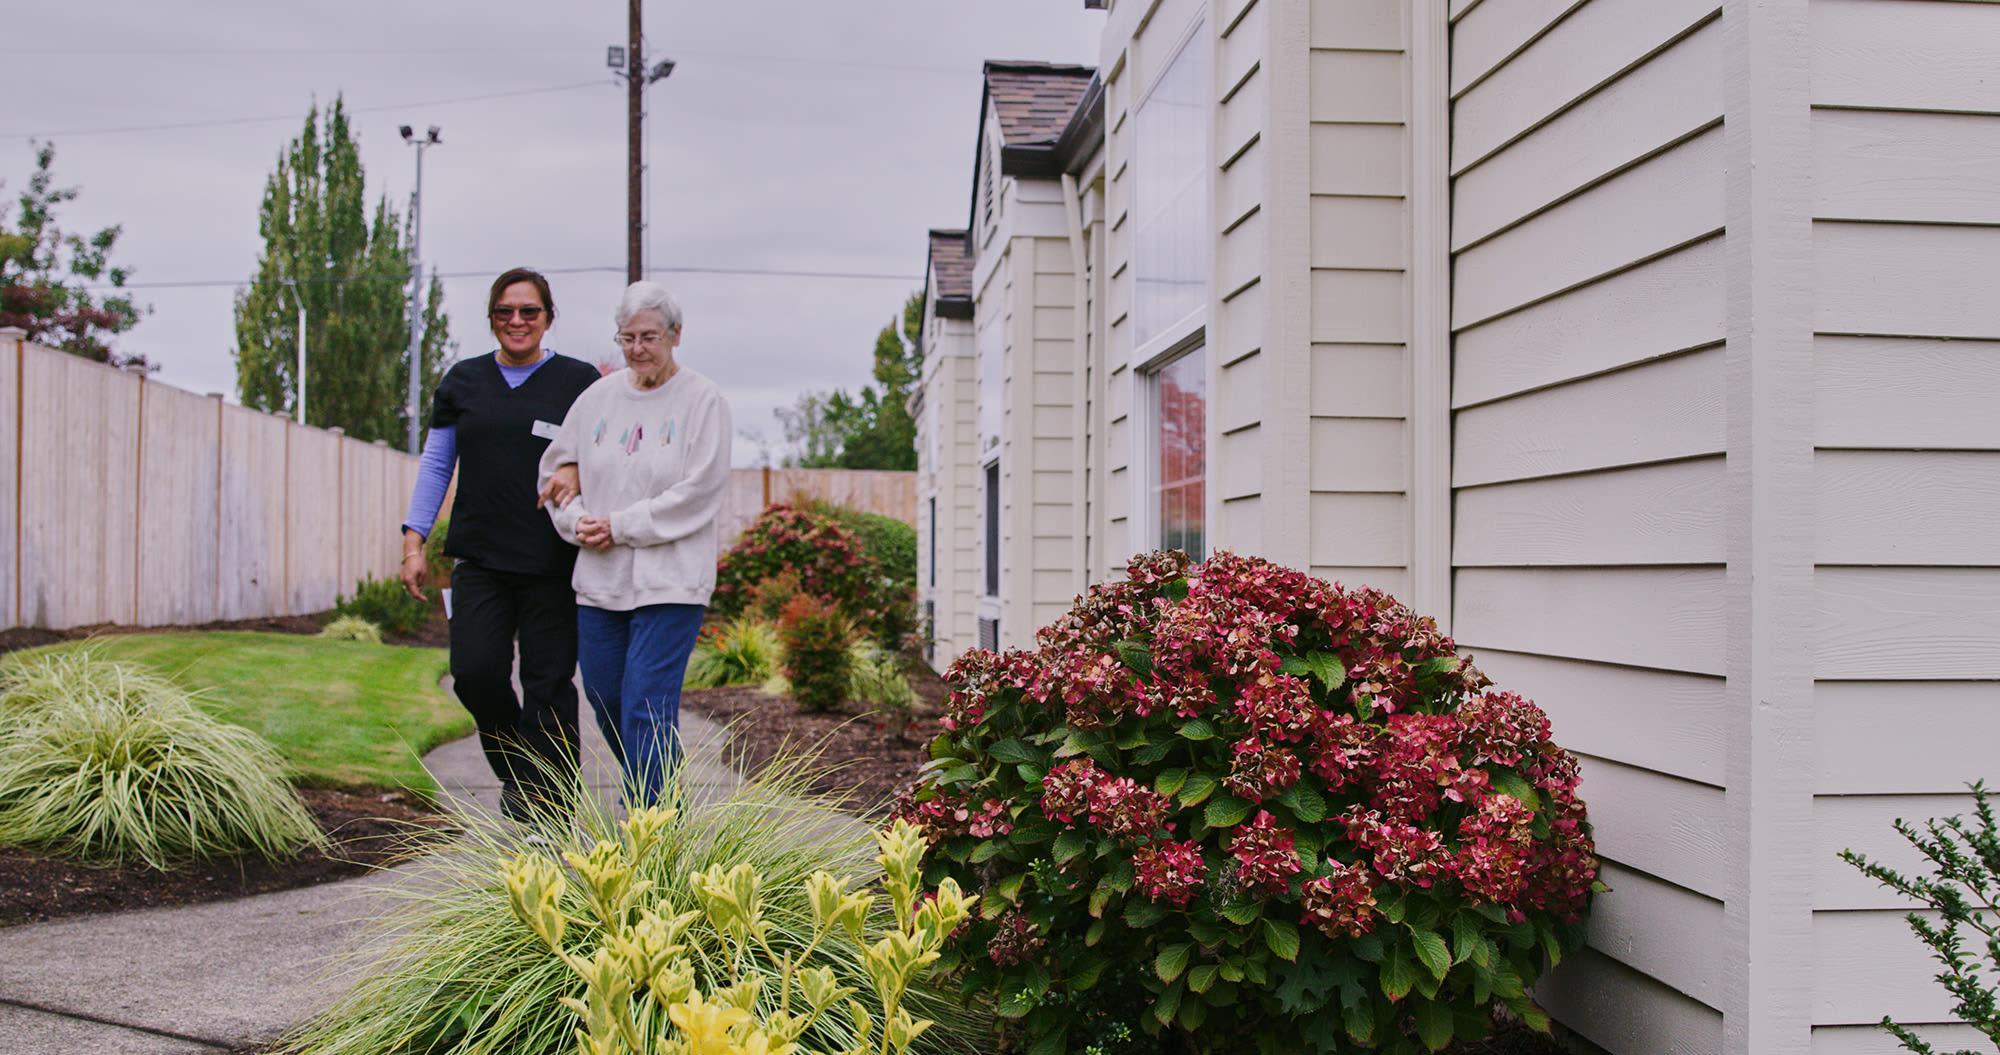 resident and a caretaker walking outside at Farmington Square Salem in Salem, Oregon